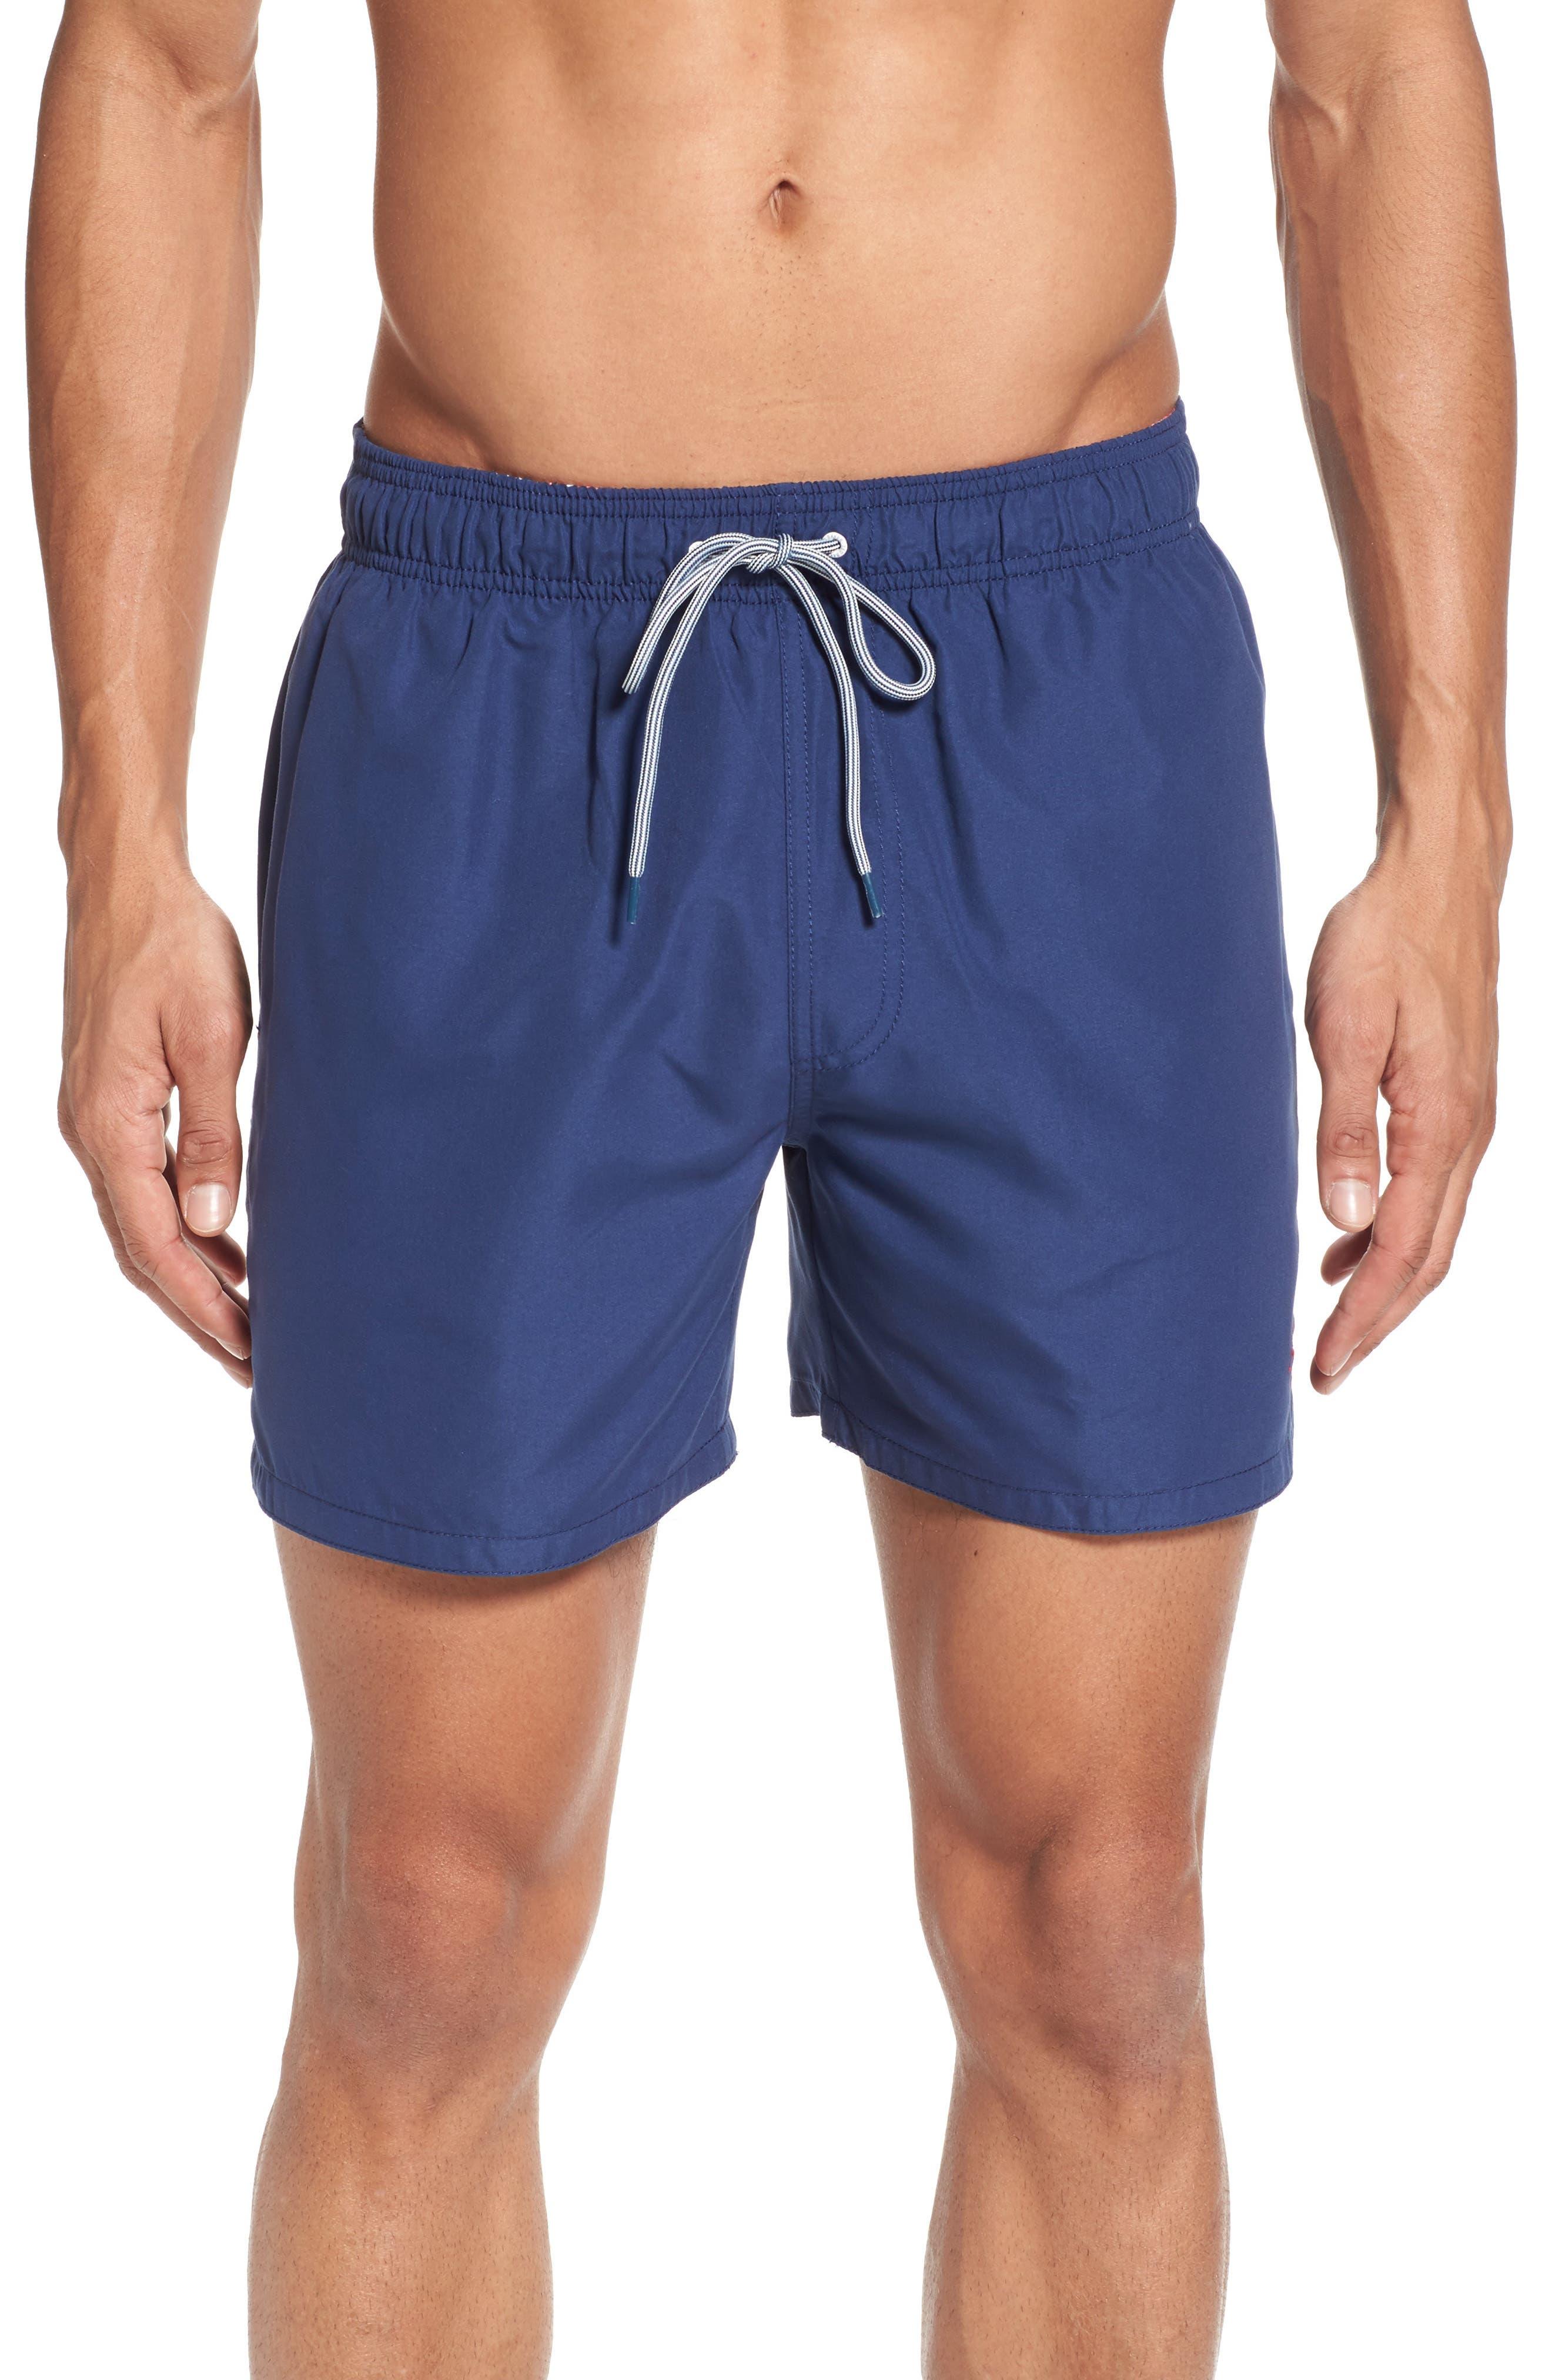 Danbury Swim Shorts,                         Main,                         color, Navy